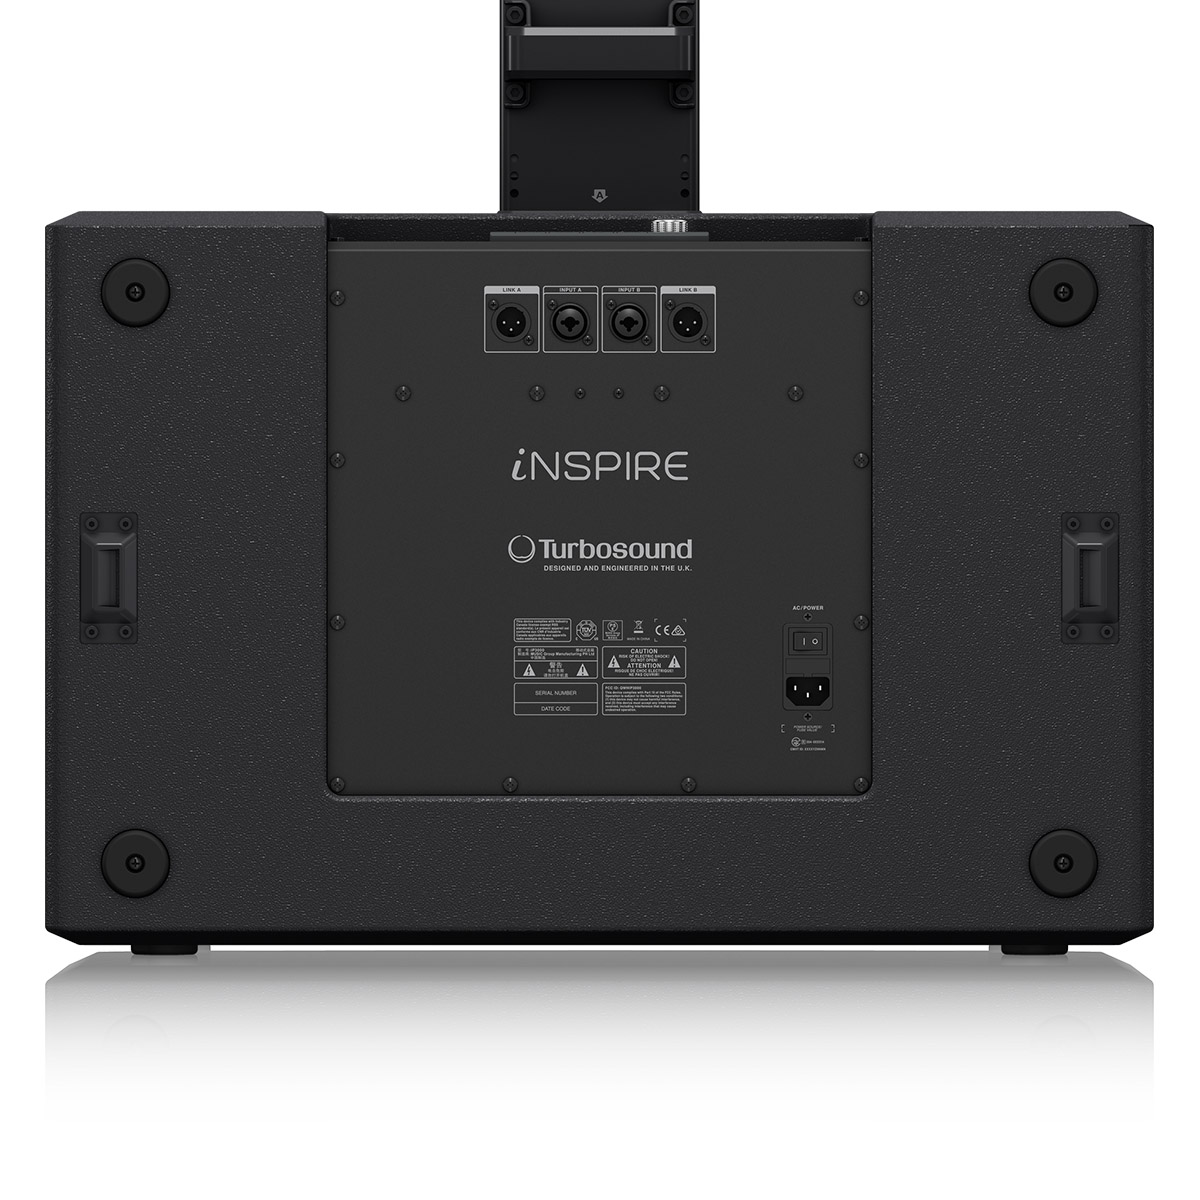 Sistema de PA portátil Ativo Turbsound iNSPIRE IP3000